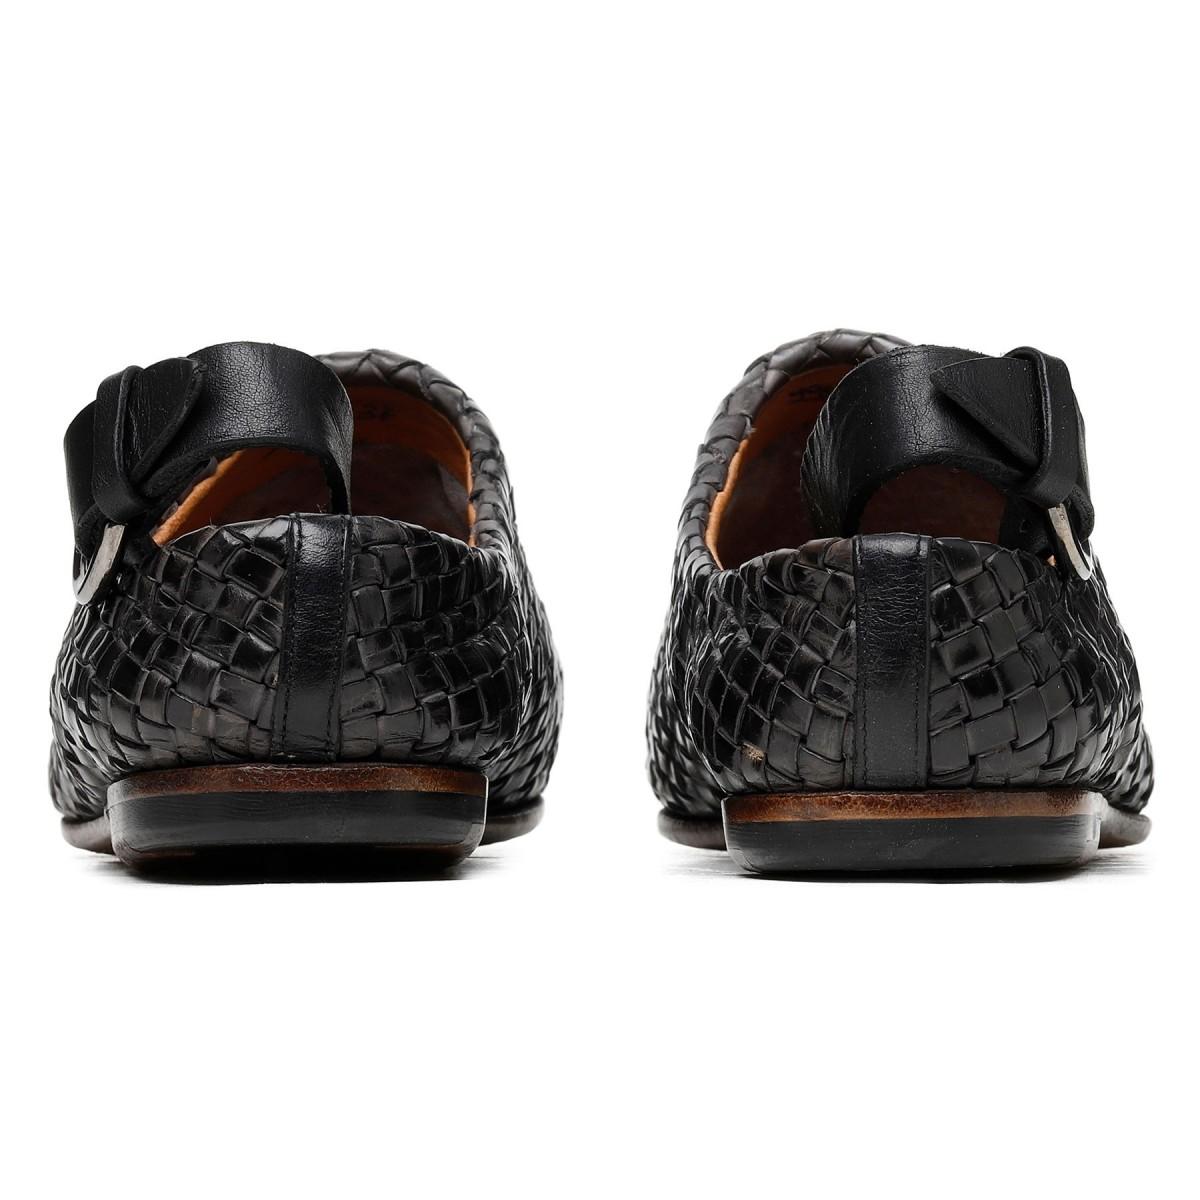 Slippers in pelle nera intrecciata